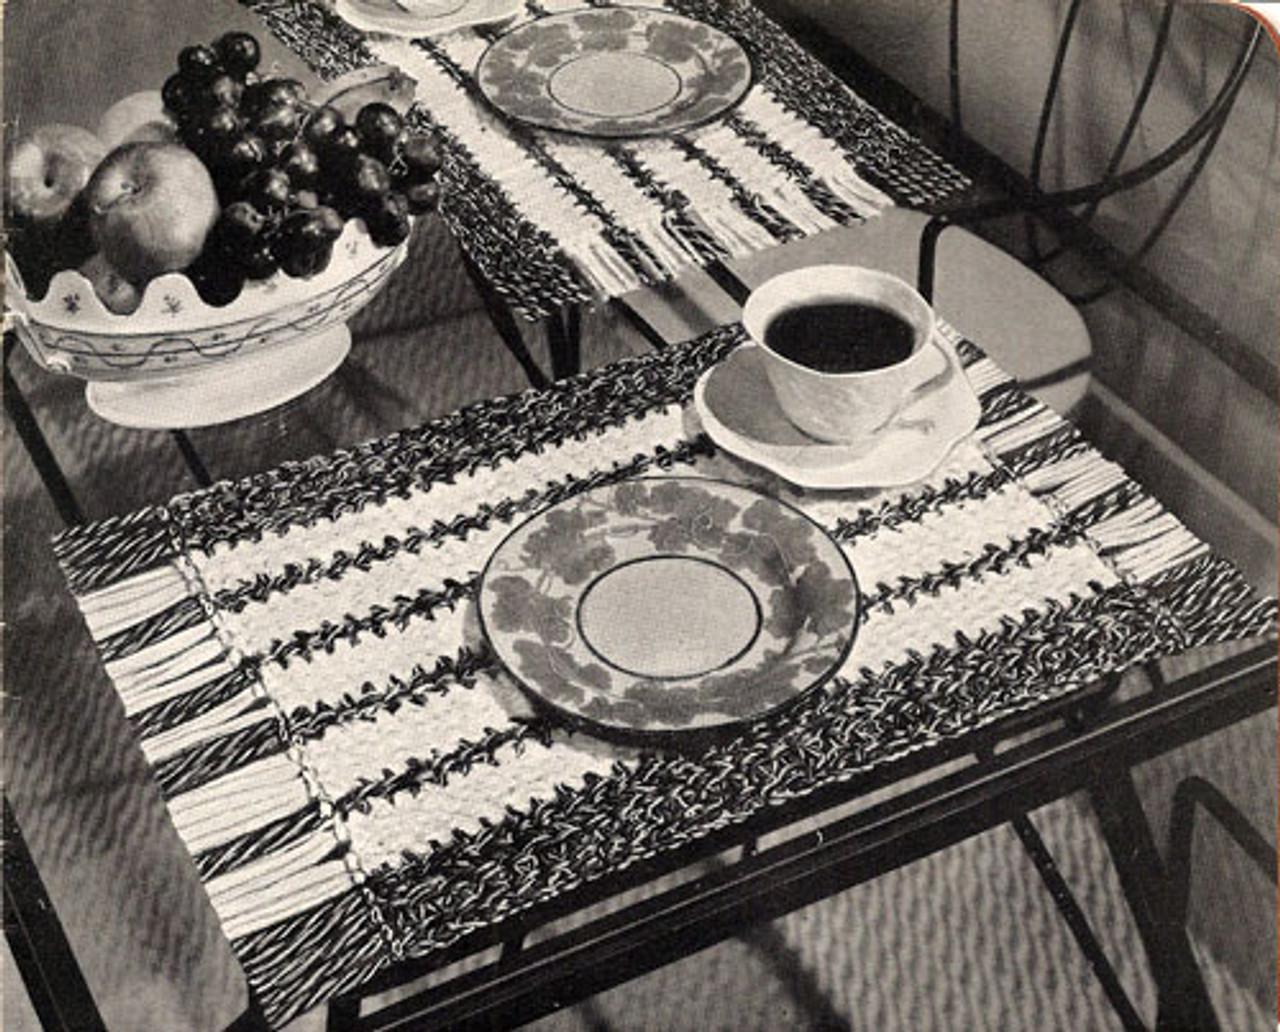 Crochet Mats Pattern with Woven Stripes